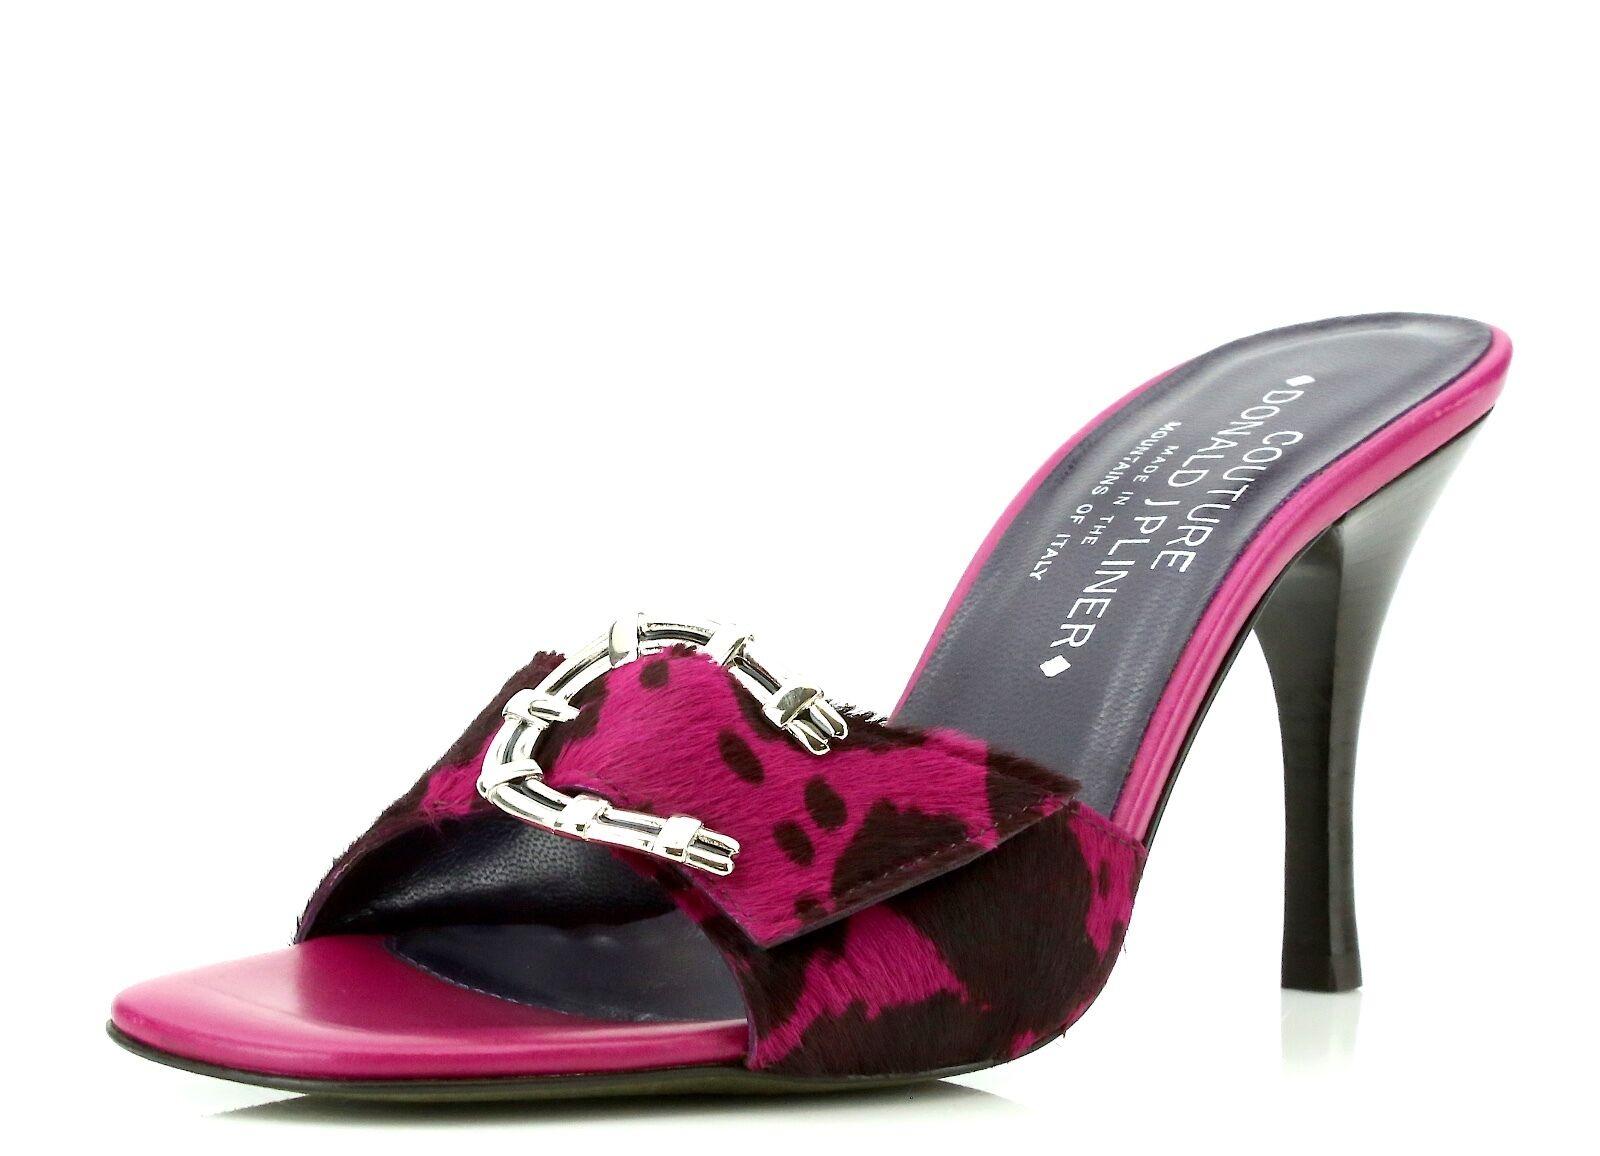 Donald J Pliner Netie Fuchsia Pink Pelle Slipper Heels 7274 Size 7.5 M NEW!